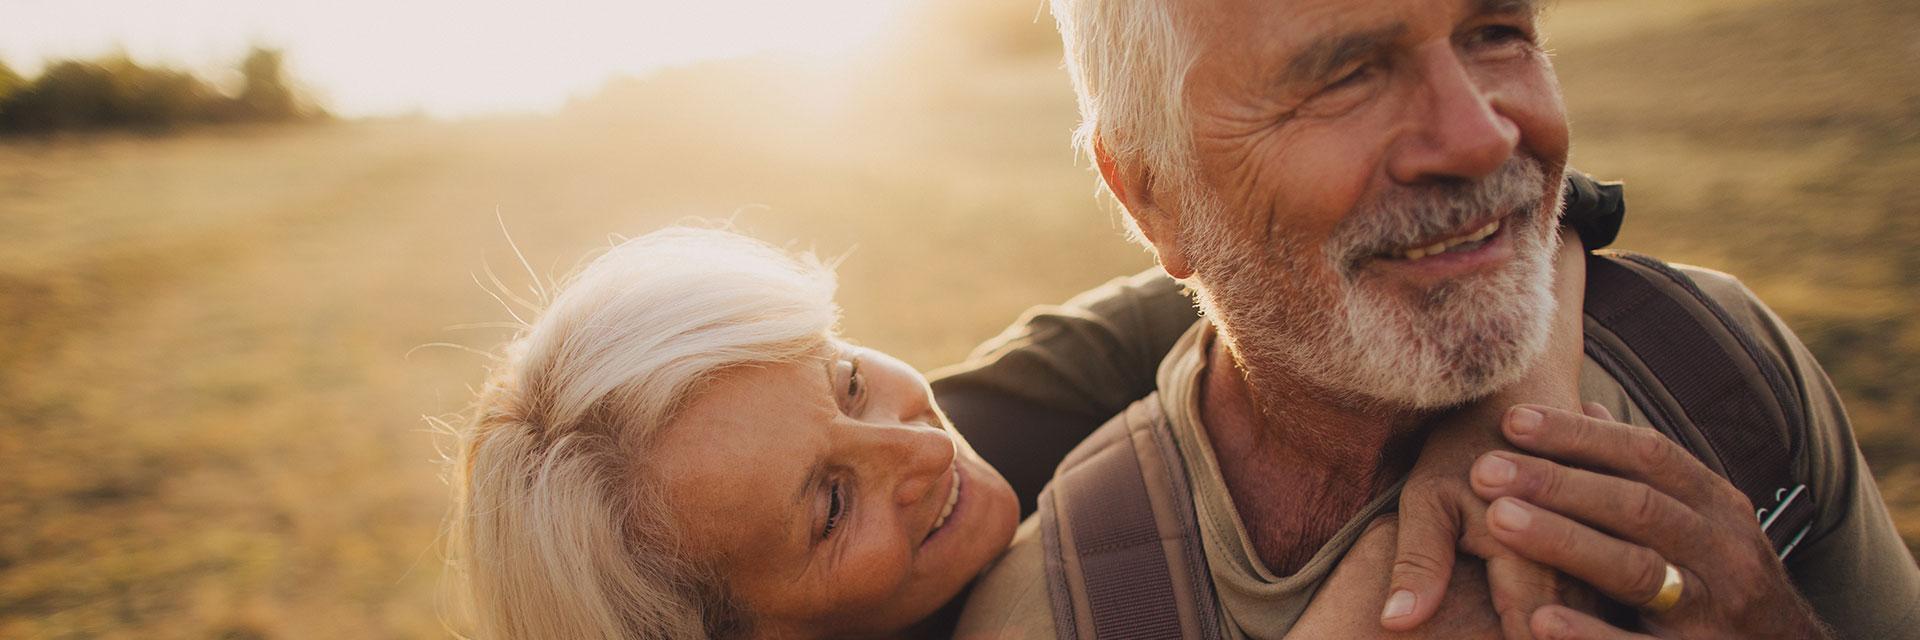 Healthy Aging Ashwagandha